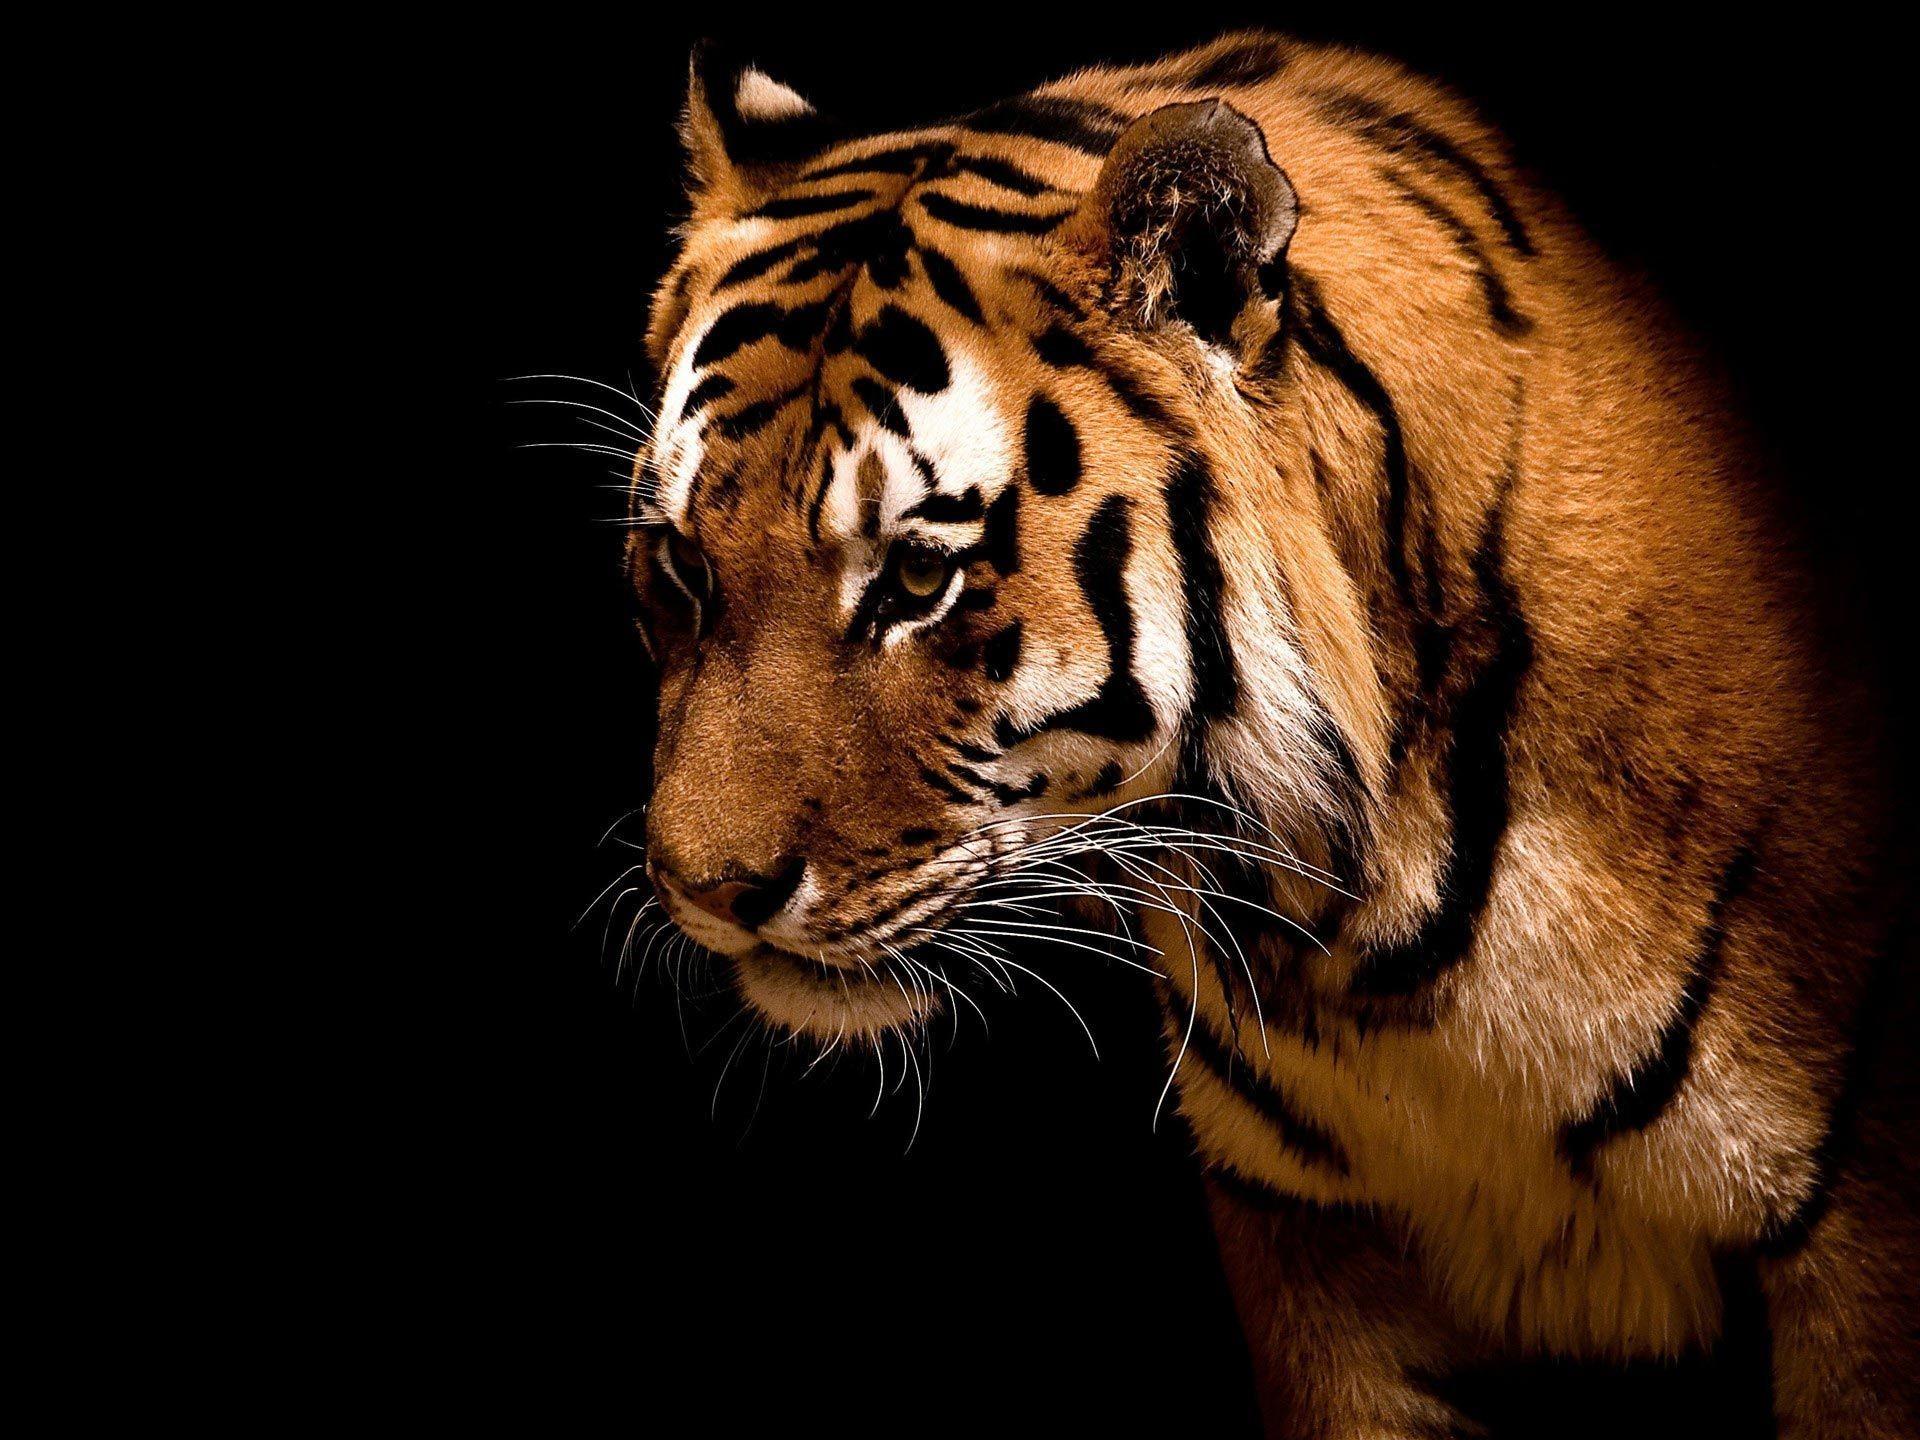 Saber Tooth Tiger Wallpaper 71 Images